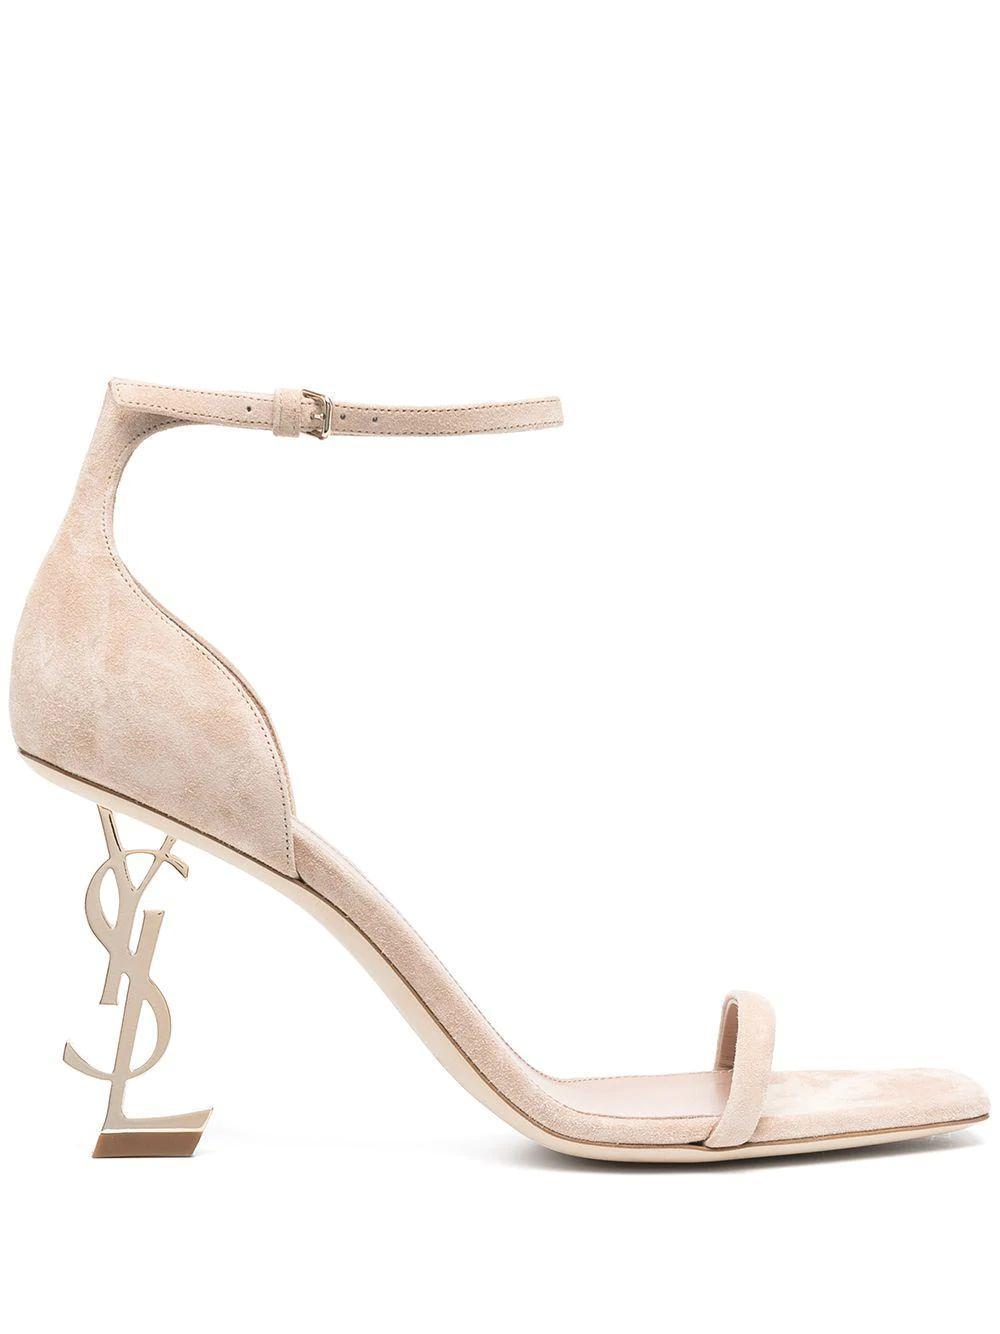 Opyum 85mm Sandal